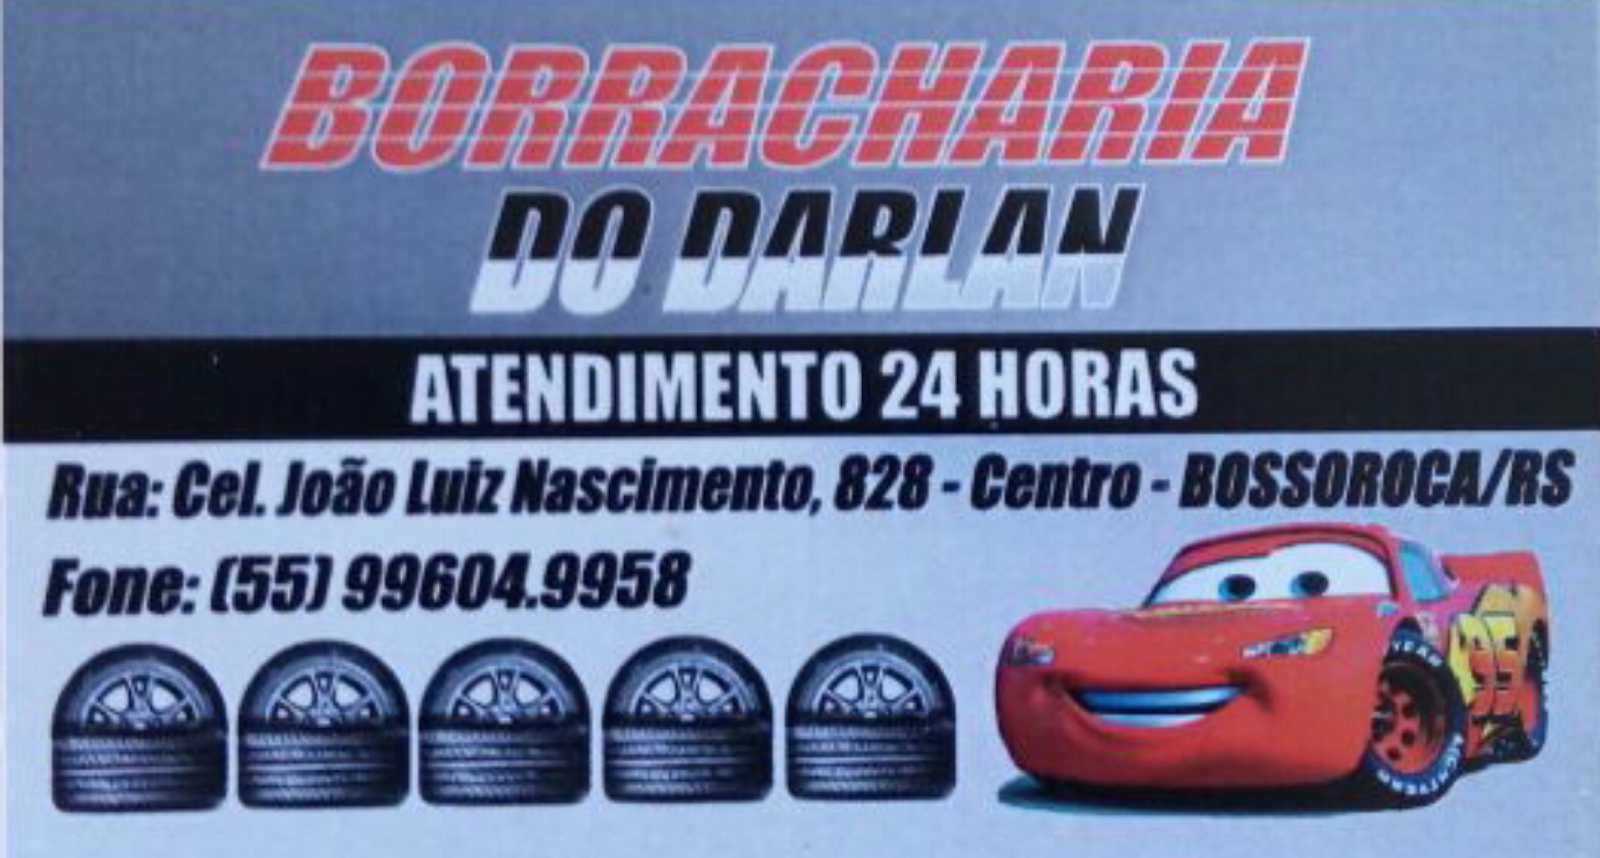 Borracharia do Darlan